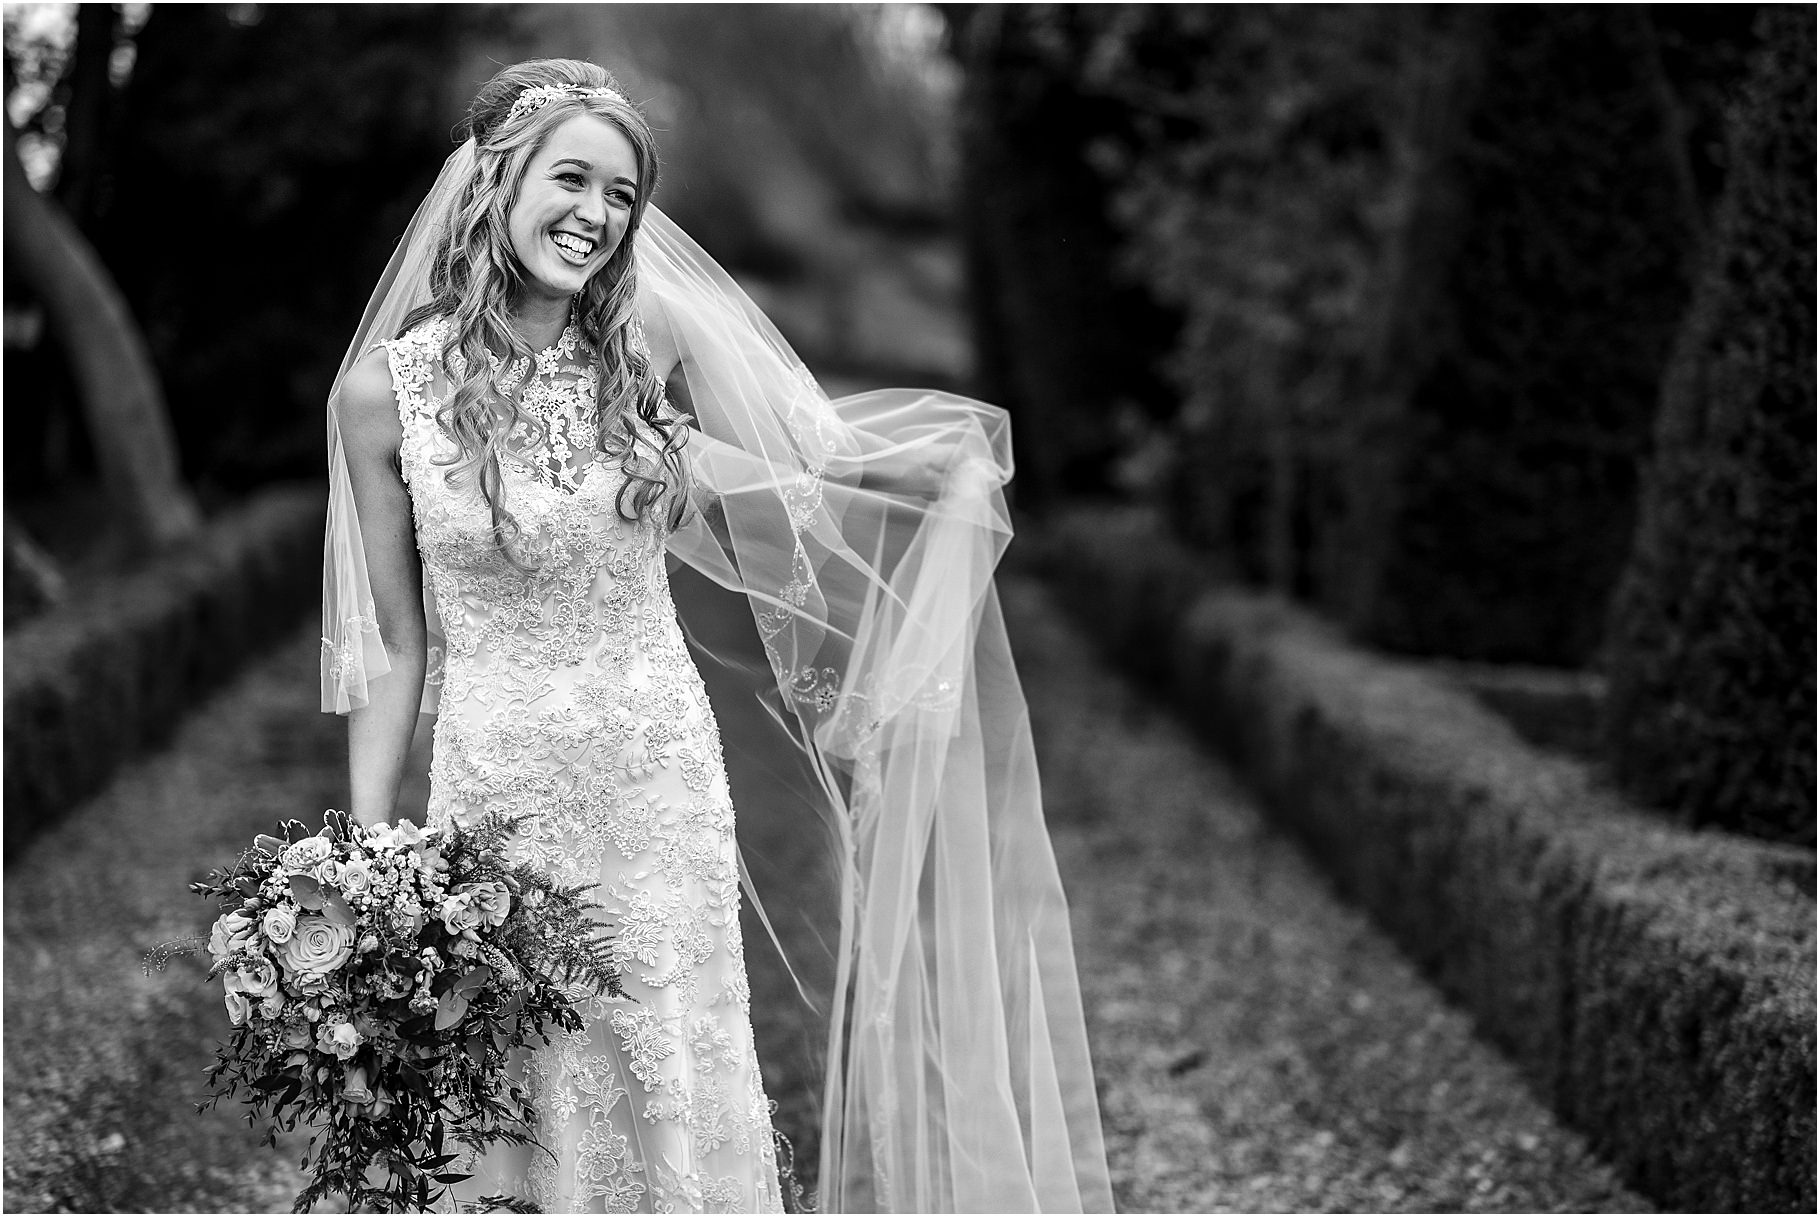 dan-wootton-photography-2017-weddings-105.jpg